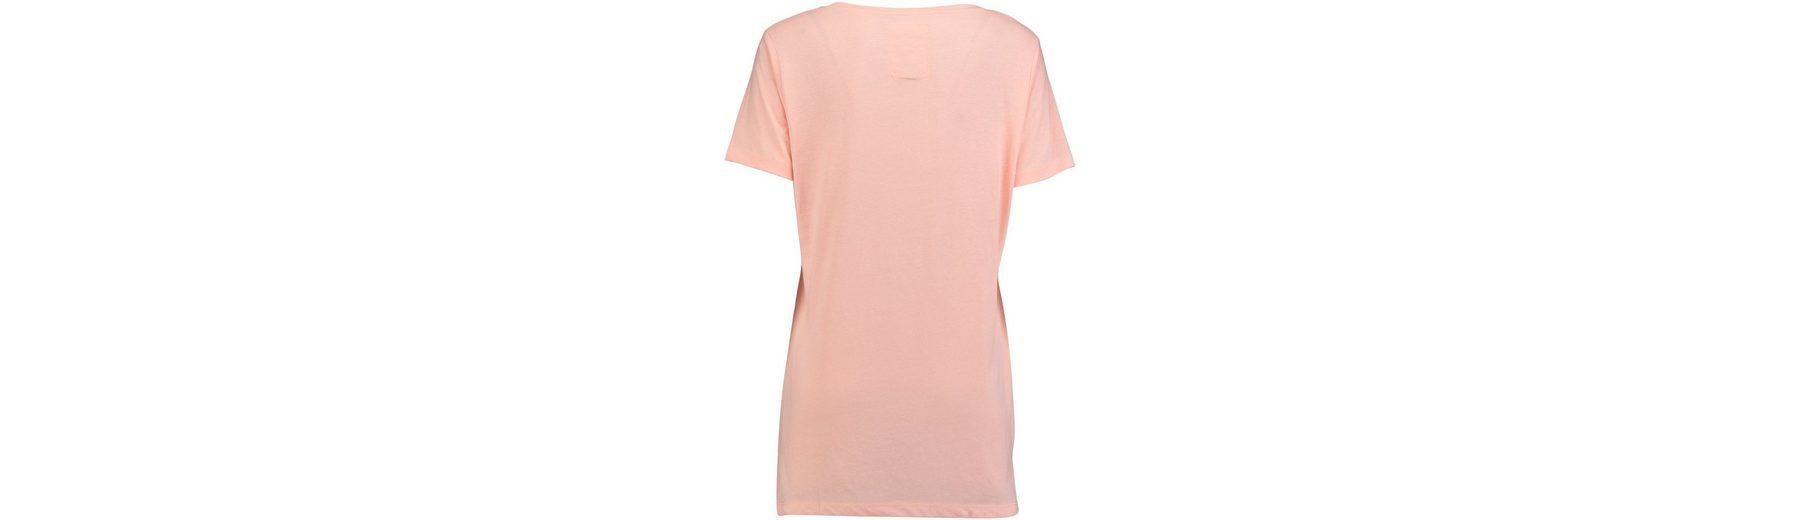 O'Neill T-Shirt kurzärmlig Jack's Base Brand 2018 Zum Verkauf Speichern Günstig Online Jwuqc